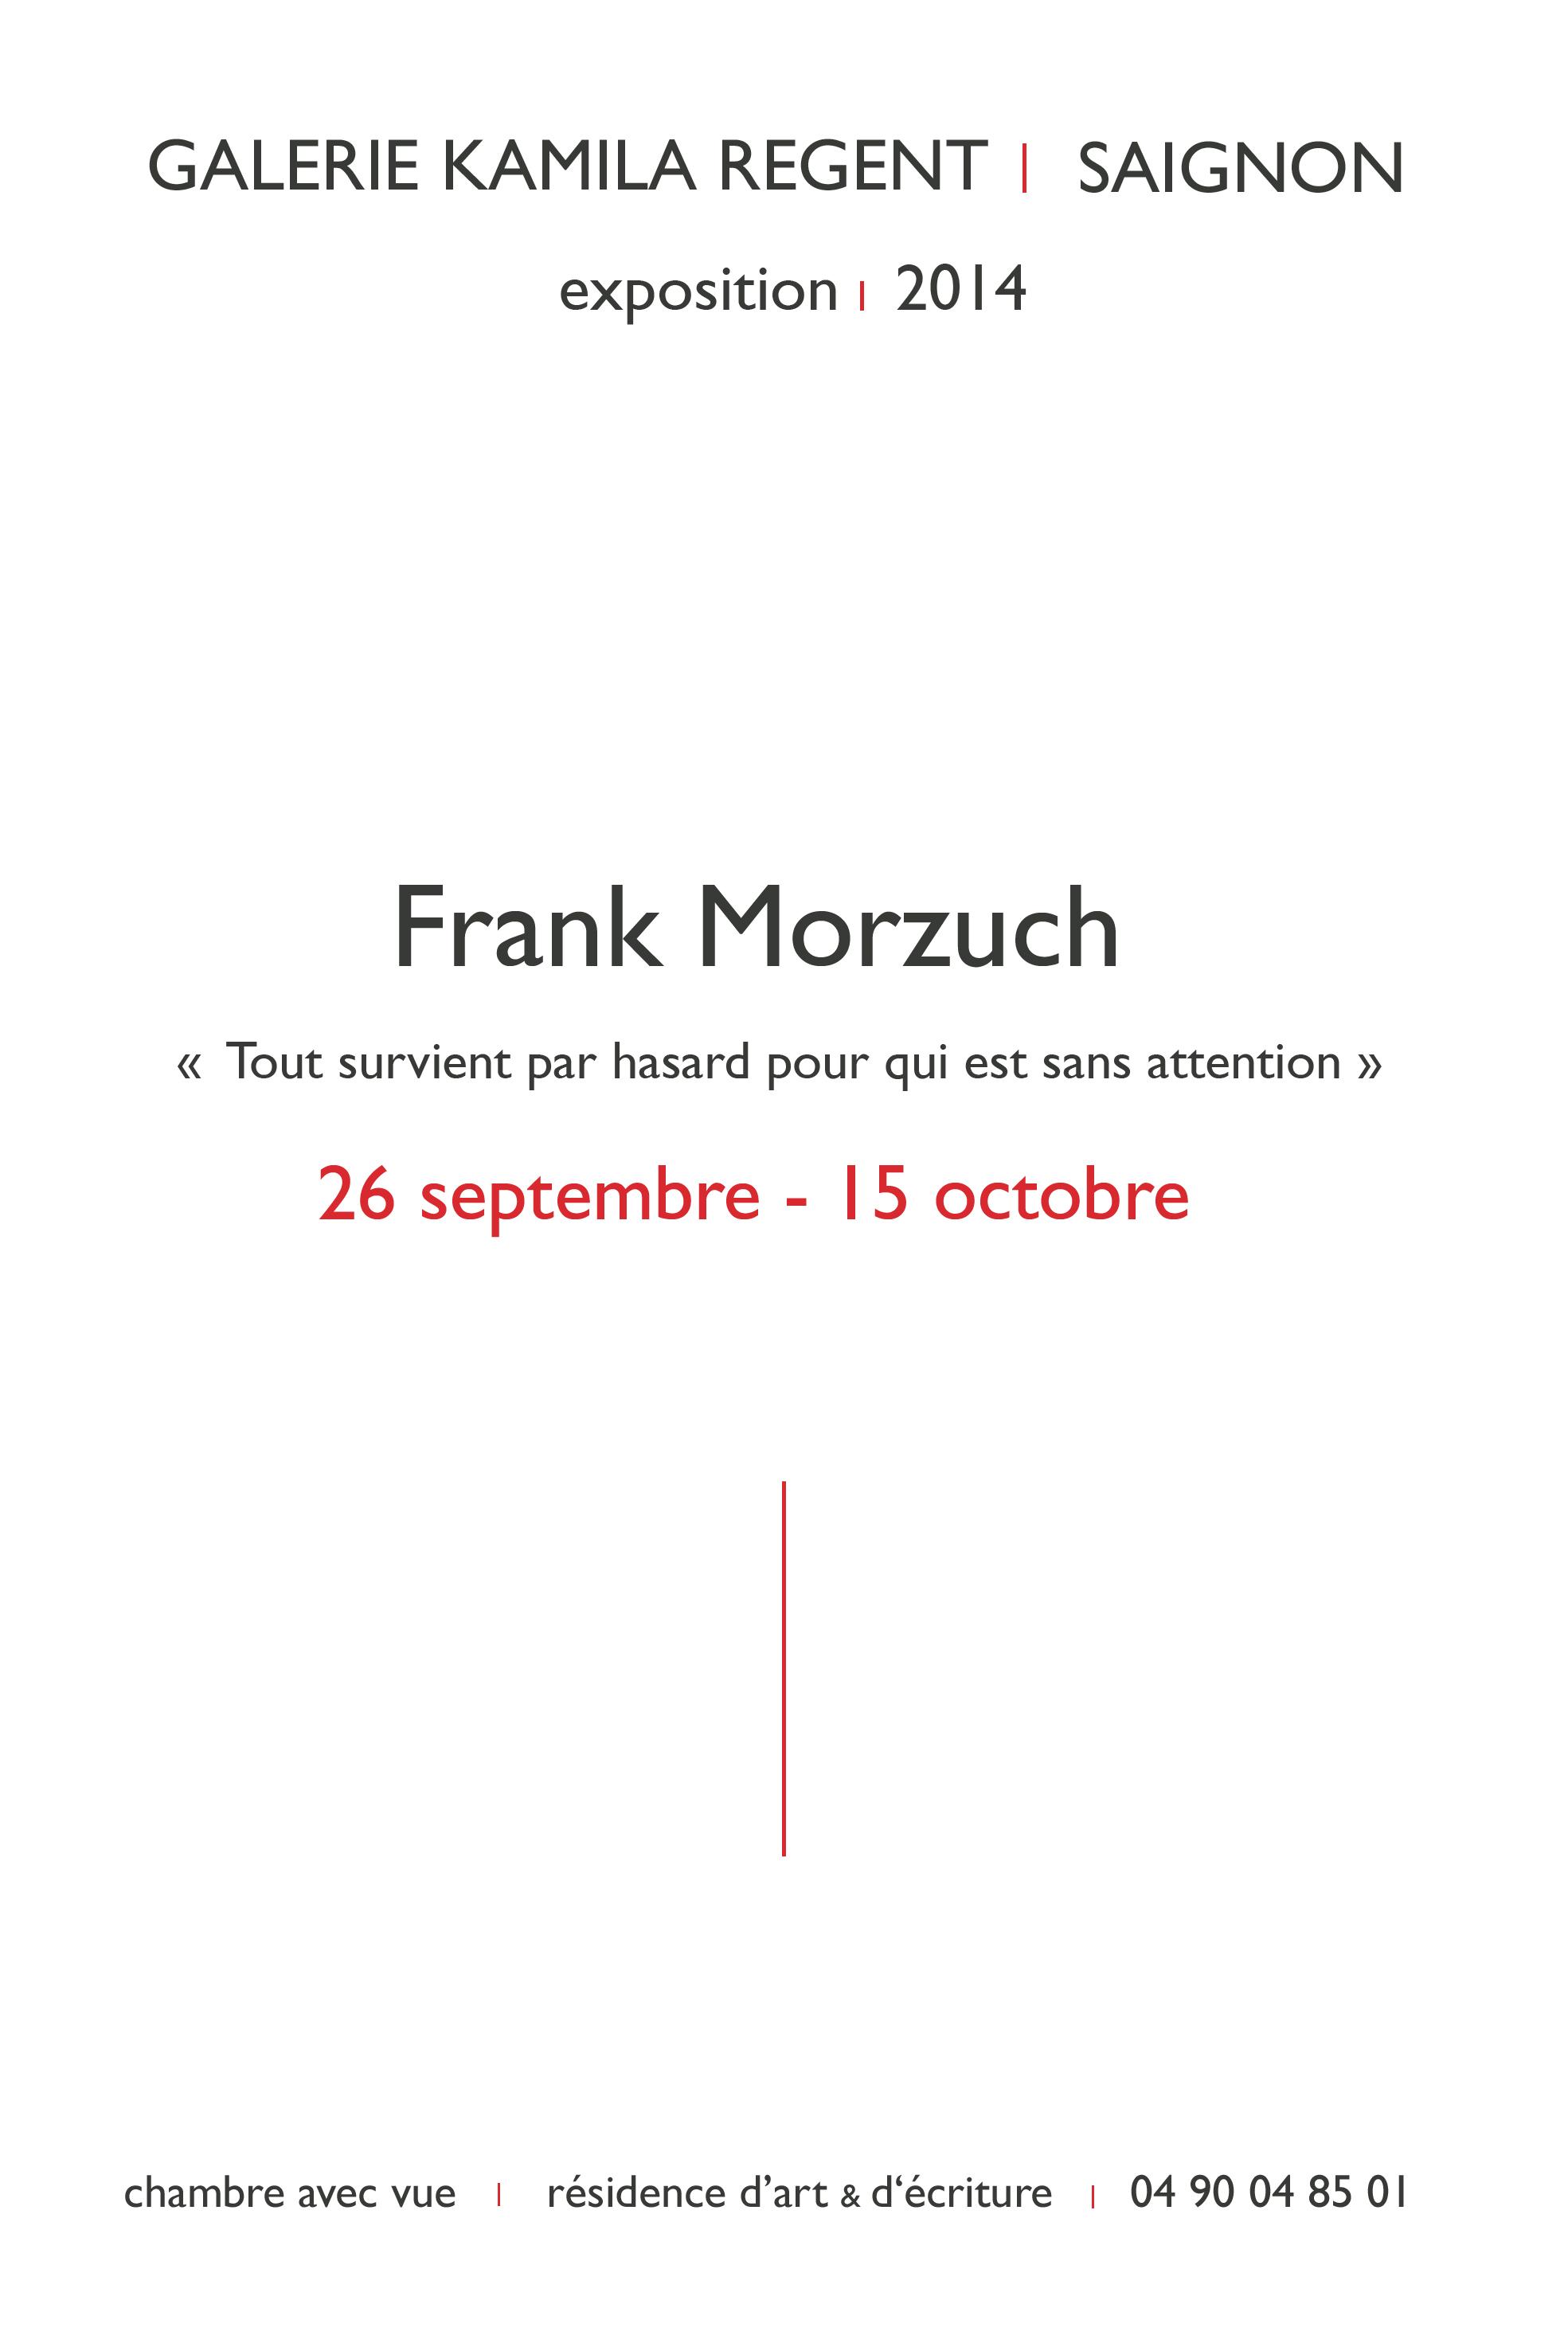 Frank Morzuch |Galerie Kamila Regent